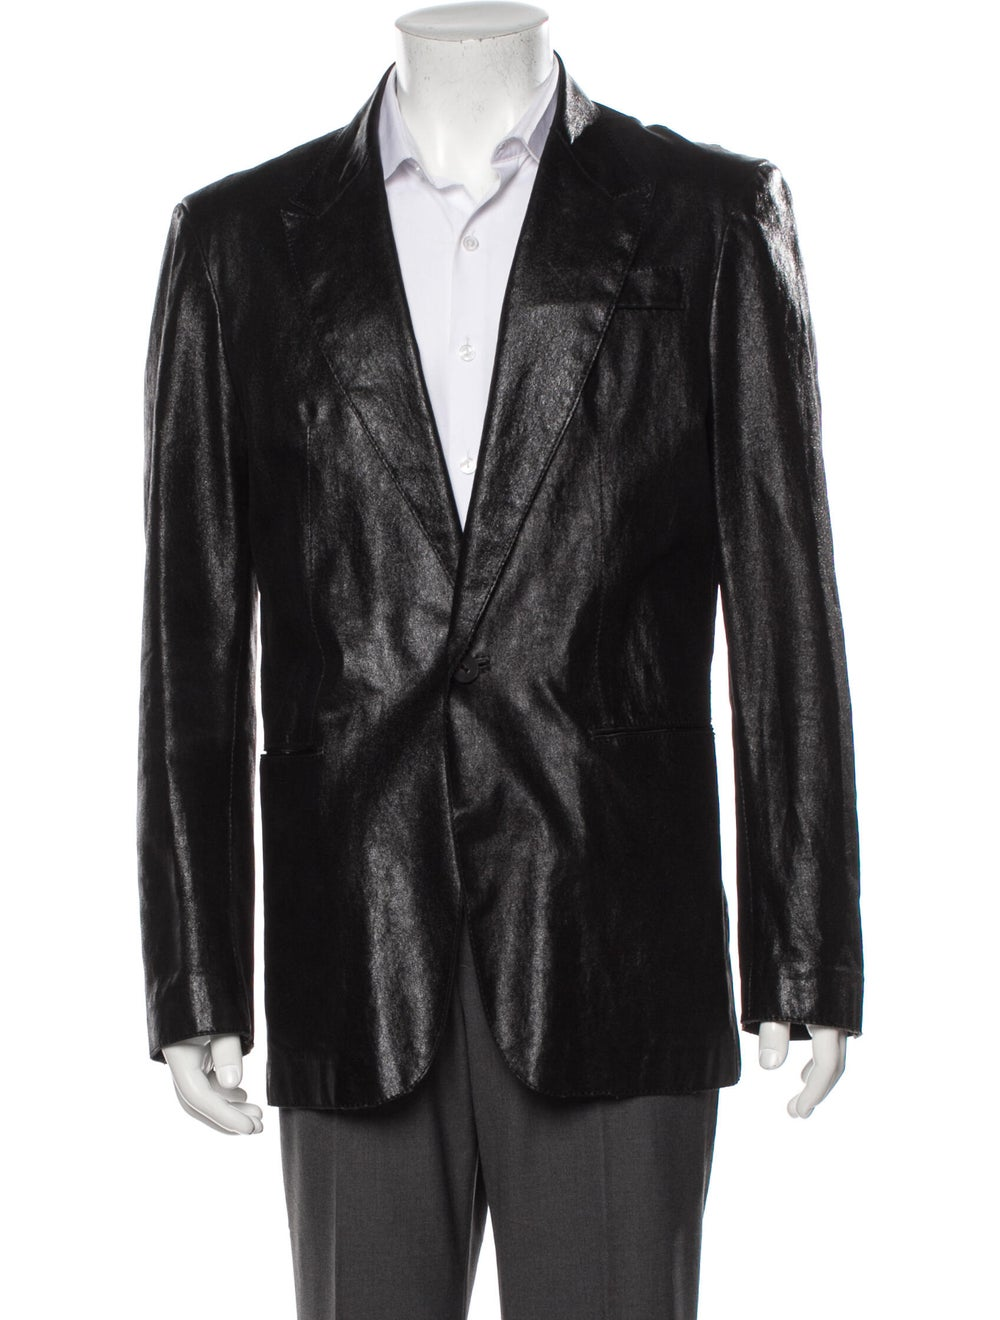 Jitrois Jacket Black - image 1